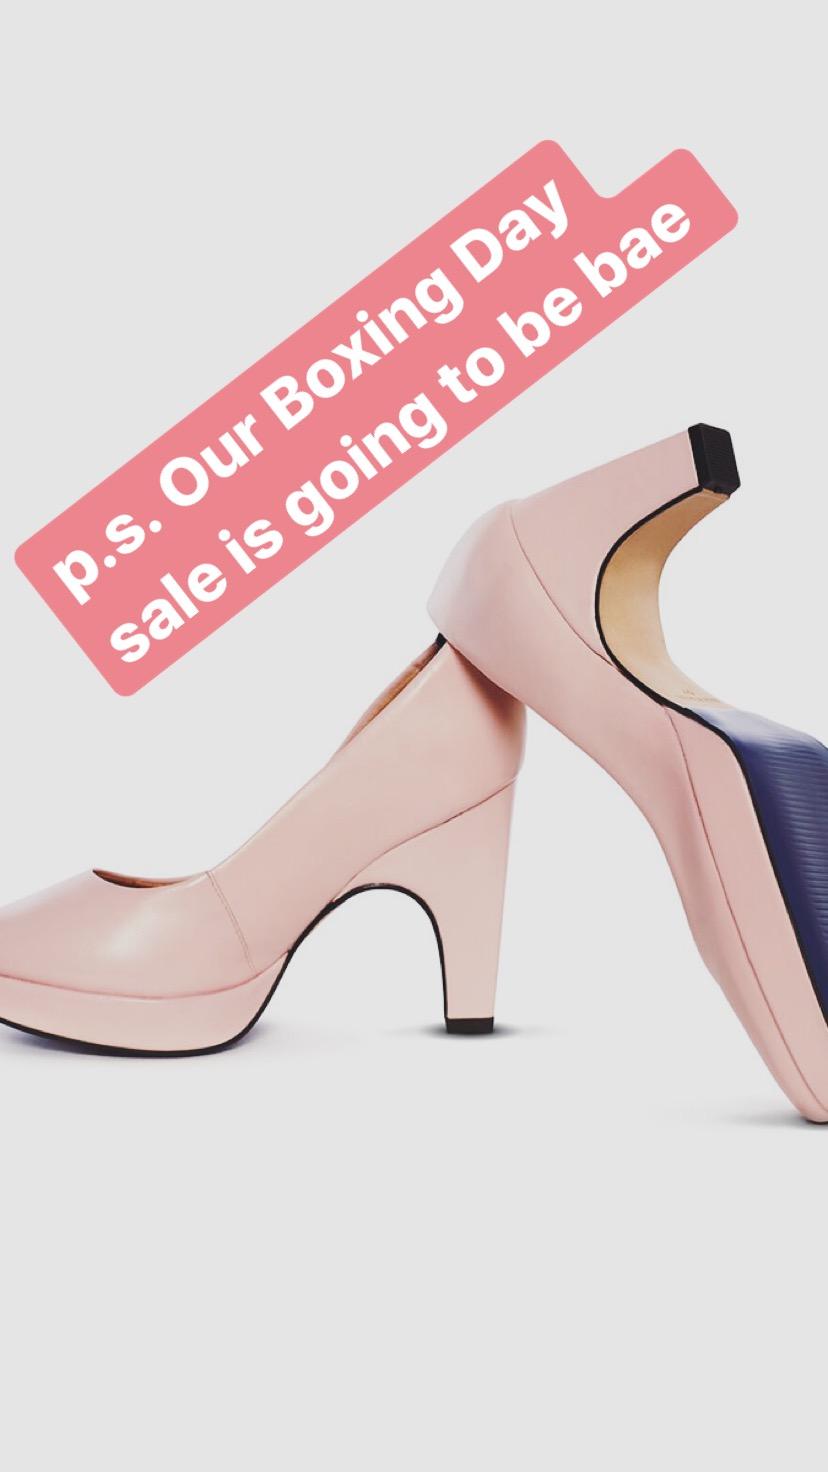 blush-pink-high-heels